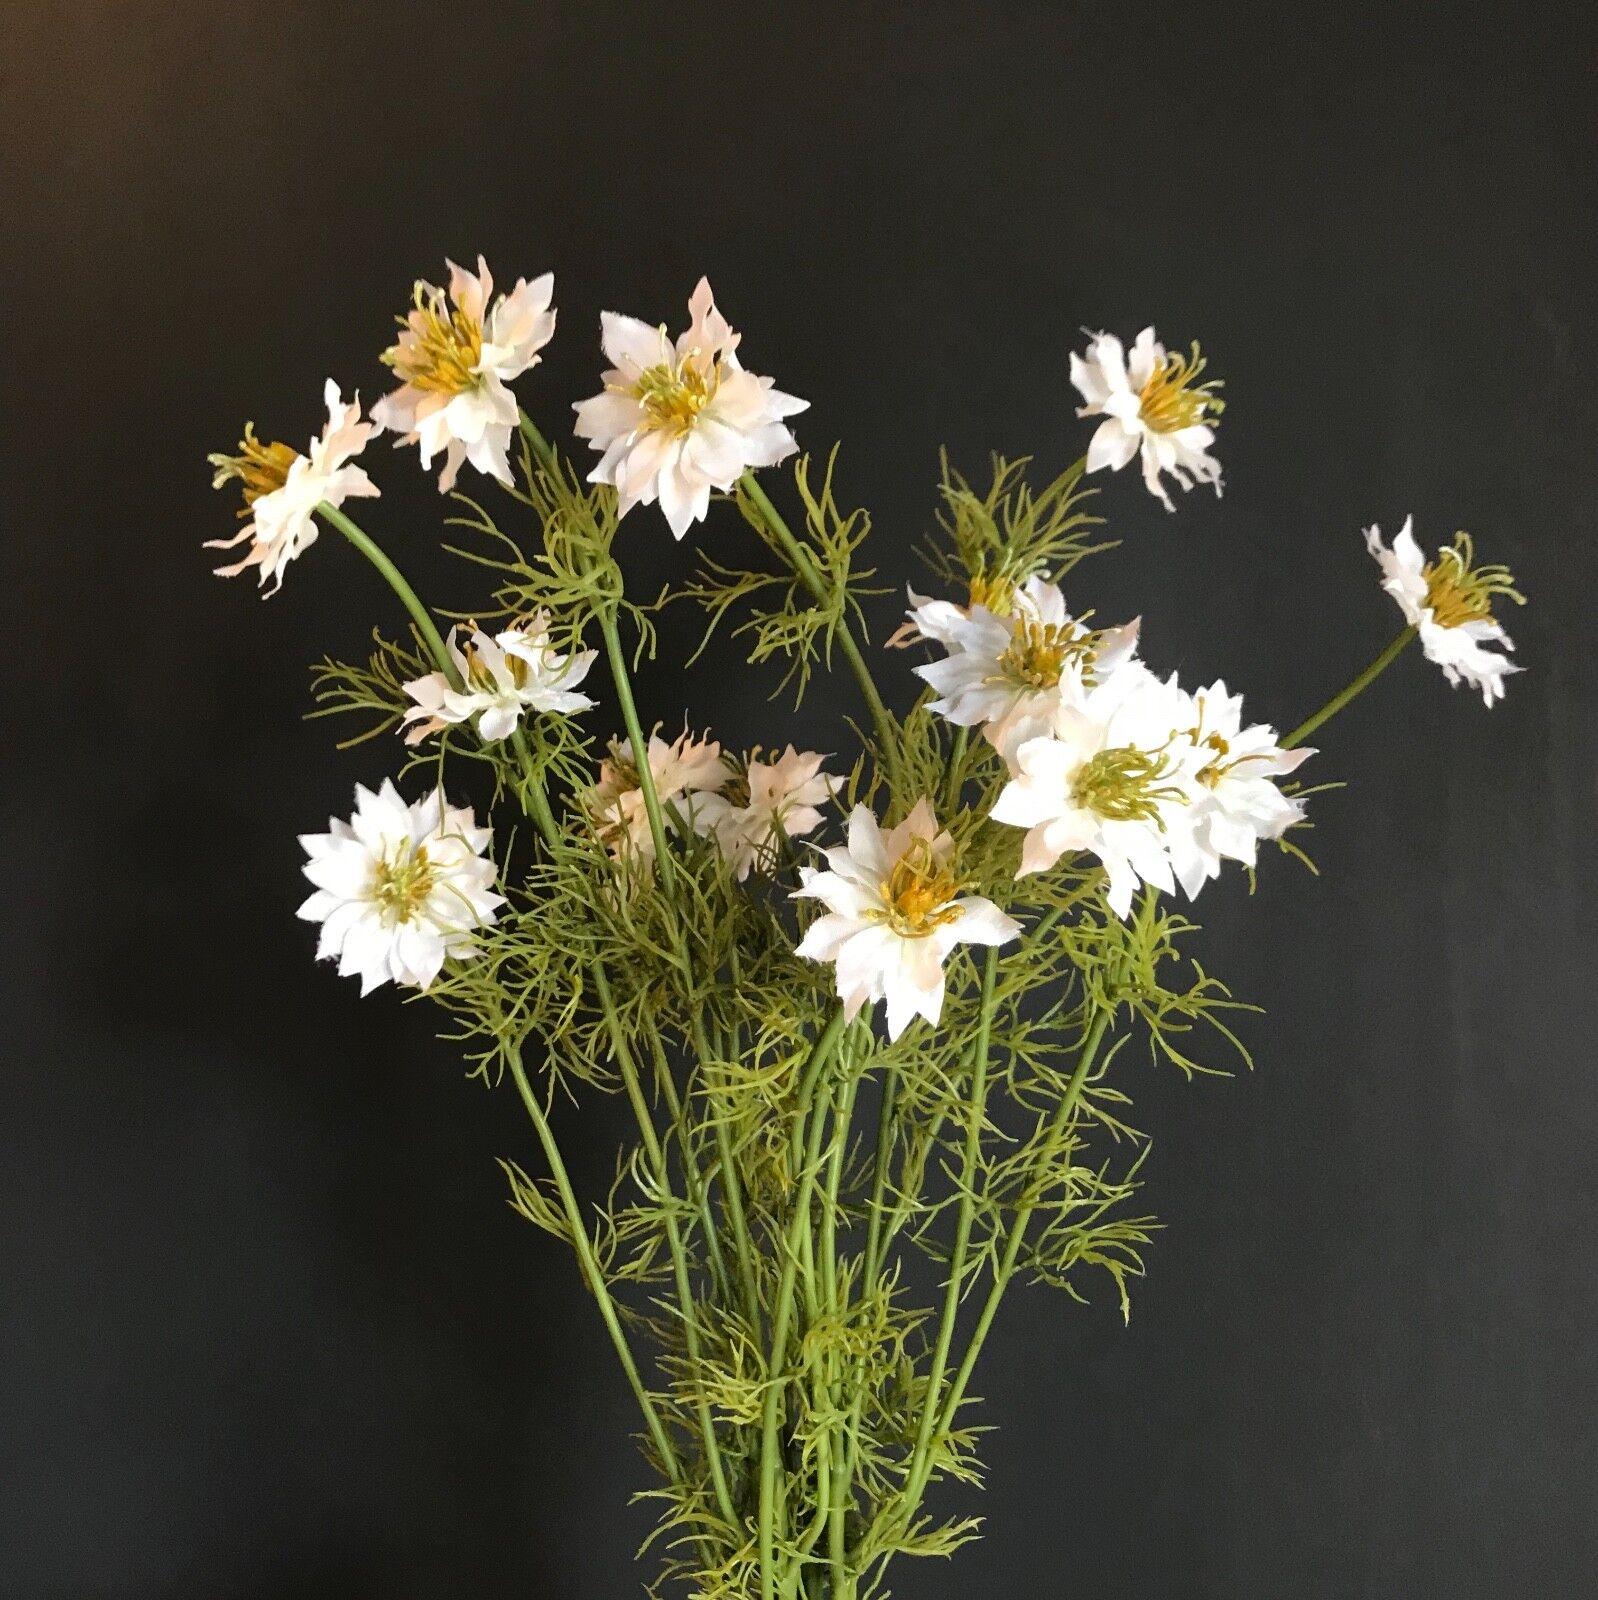 Bunch Artificial Weiß Nigella, Realistic Wild  Summer Meadow Flowers Daisies